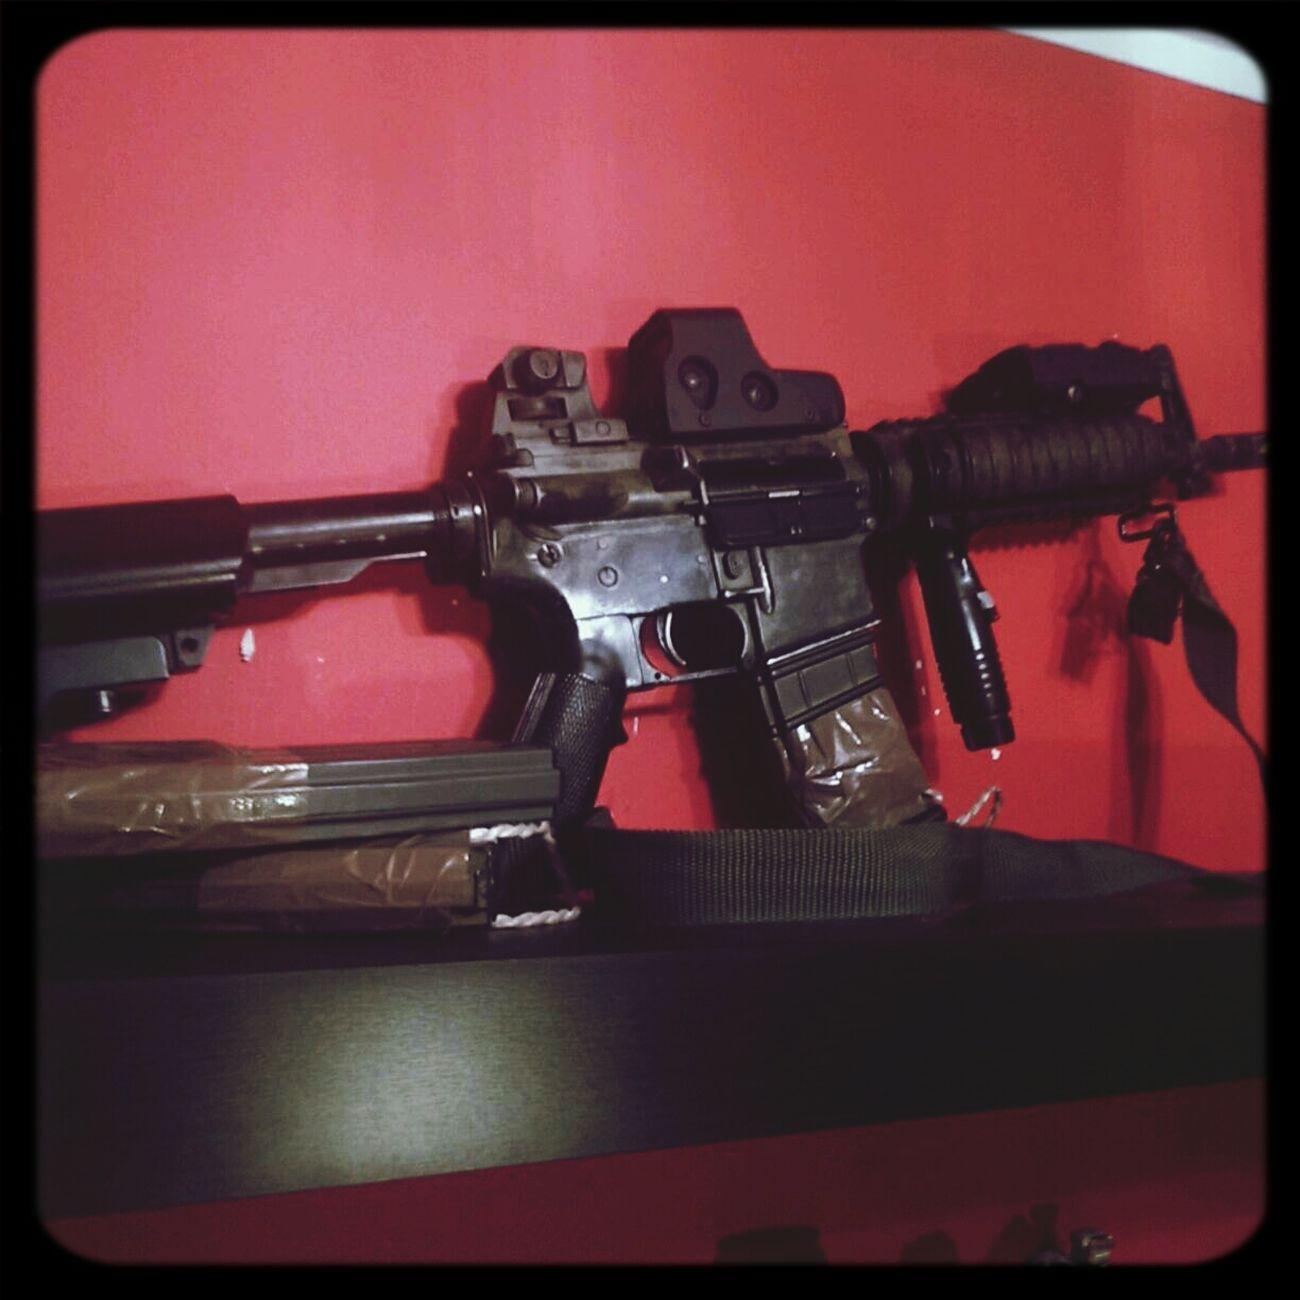 M4 Eotech Tactical